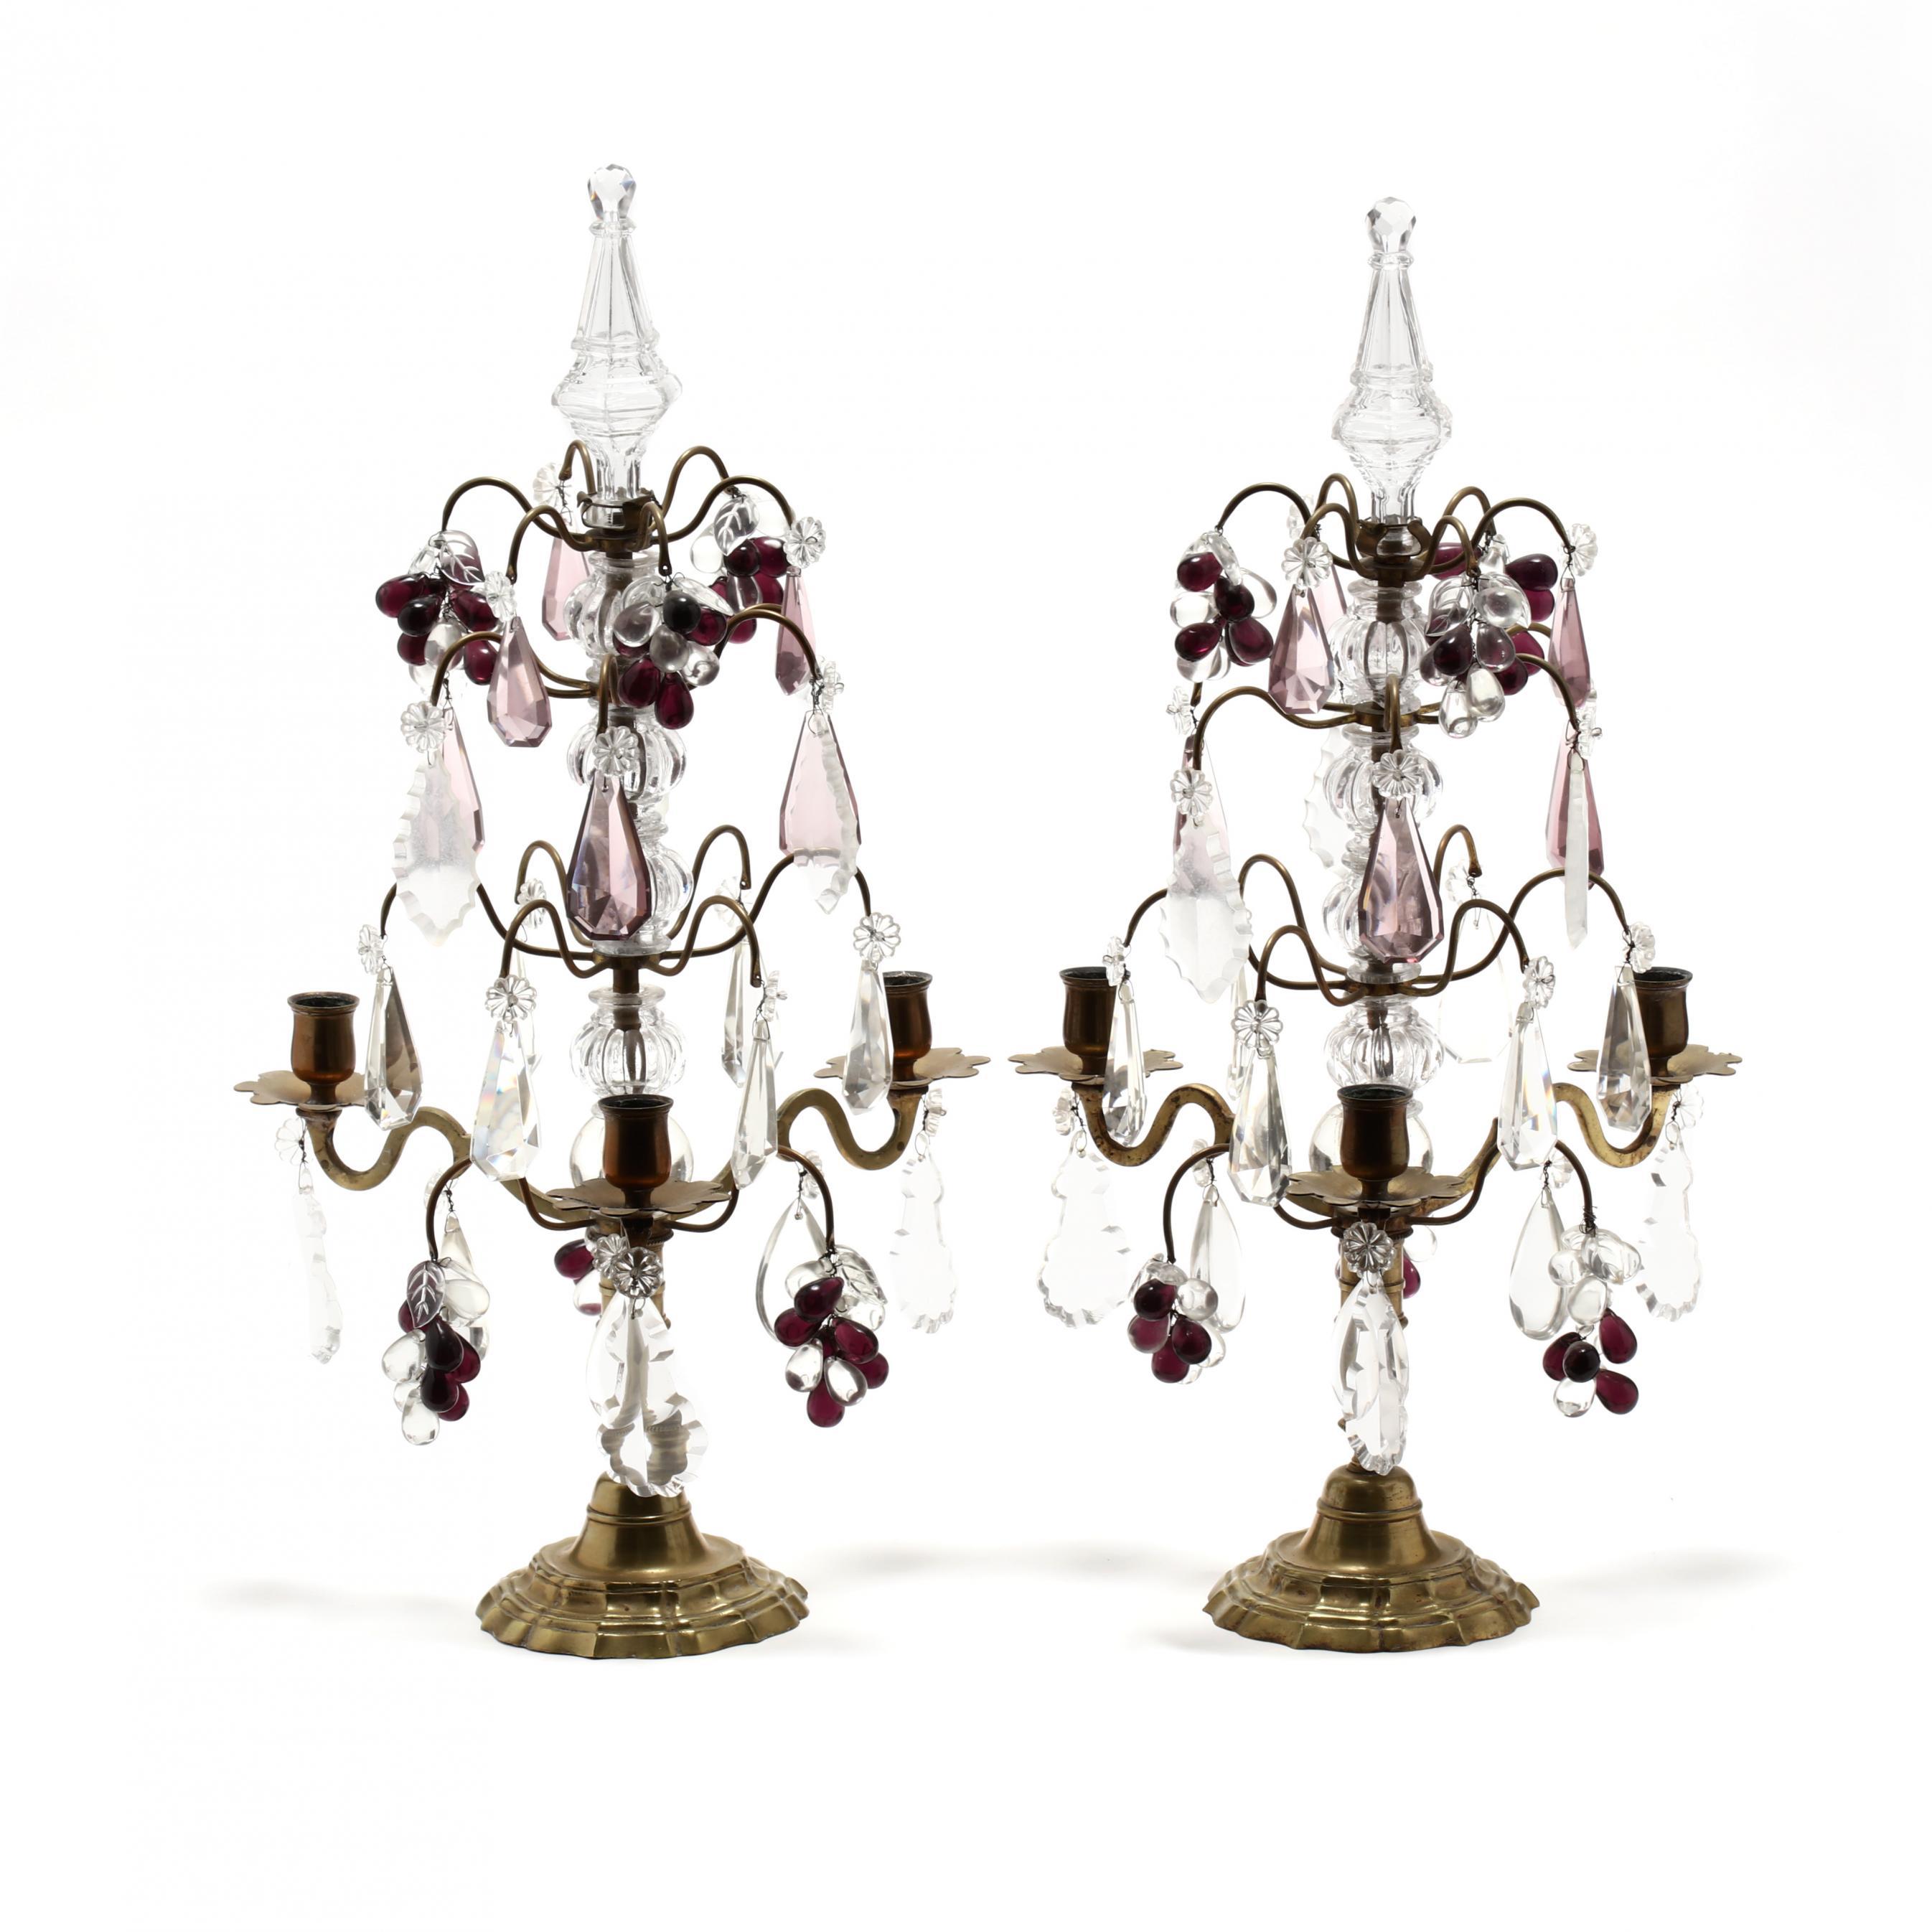 a-pair-of-vintage-italian-drop-prism-candelabra